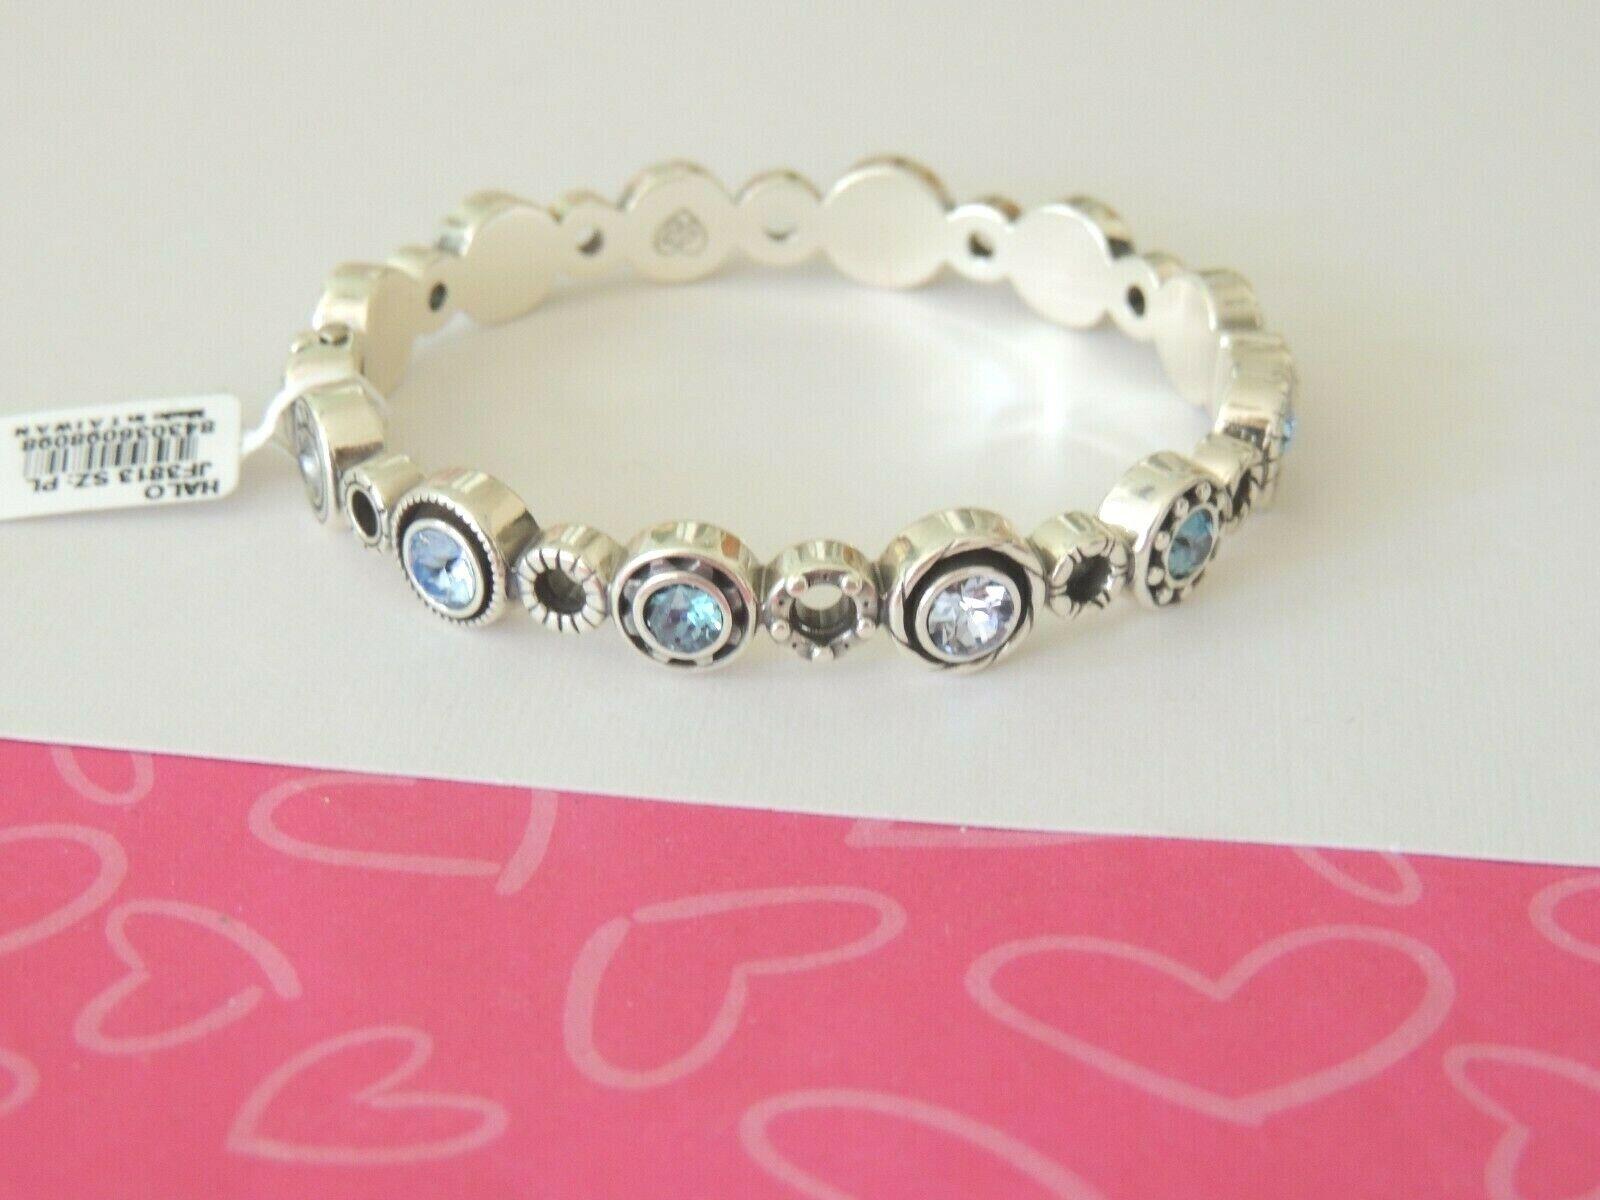 Brighton HALO Blue Enamel Crystals Bangle Bracelet New tags